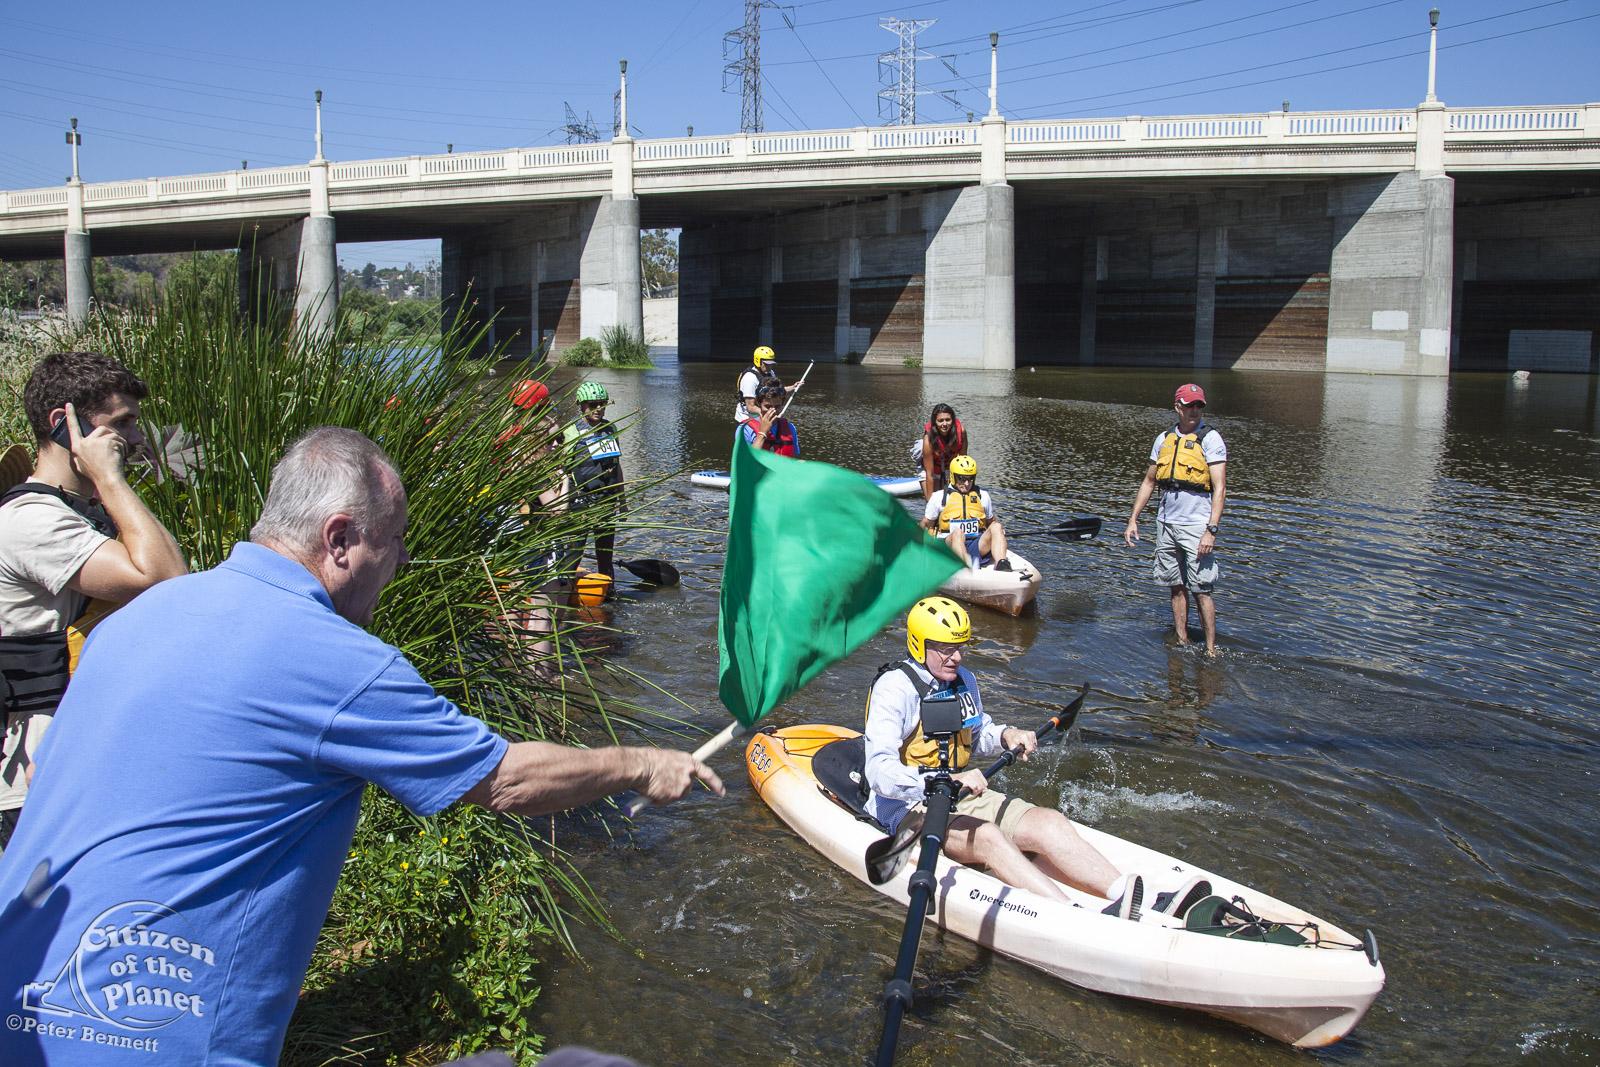 US_CA_48_3890_la_river_boat_race.jpg